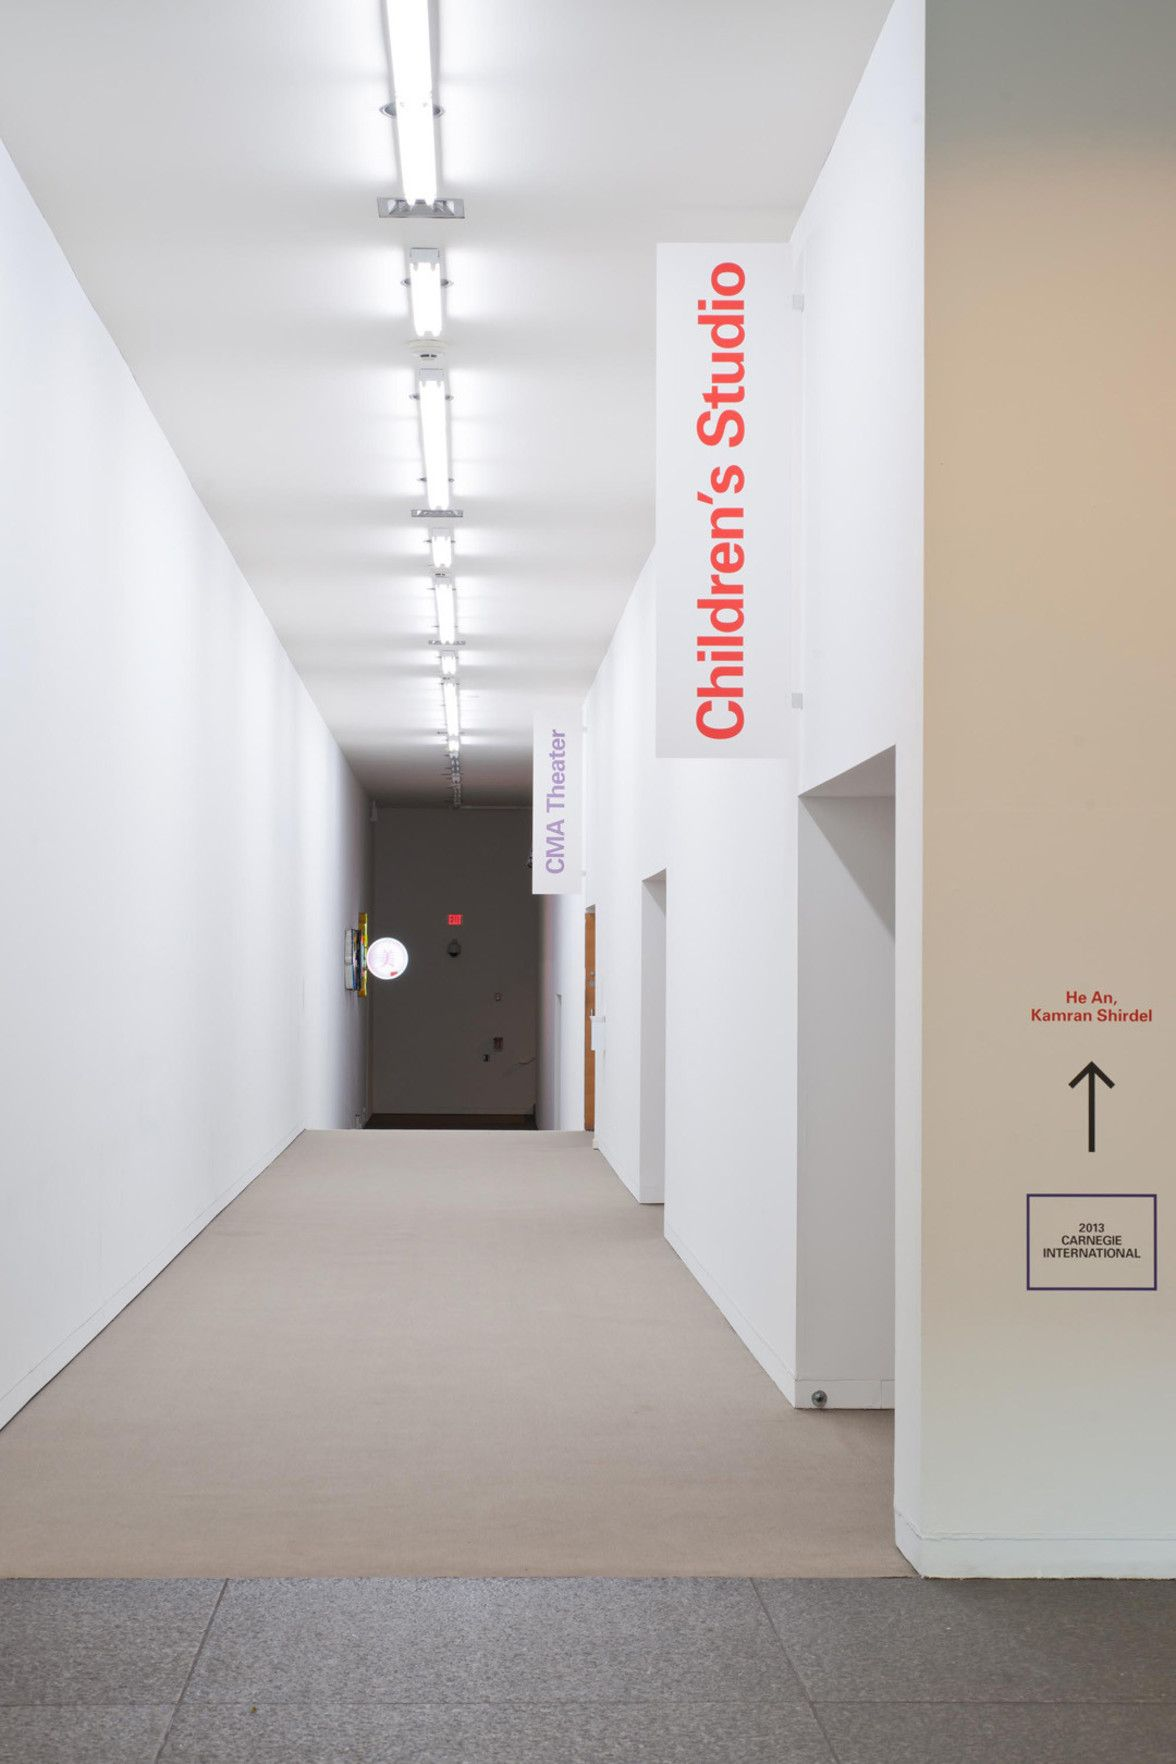 Chad Kloepfer - 2013 Carnegie International